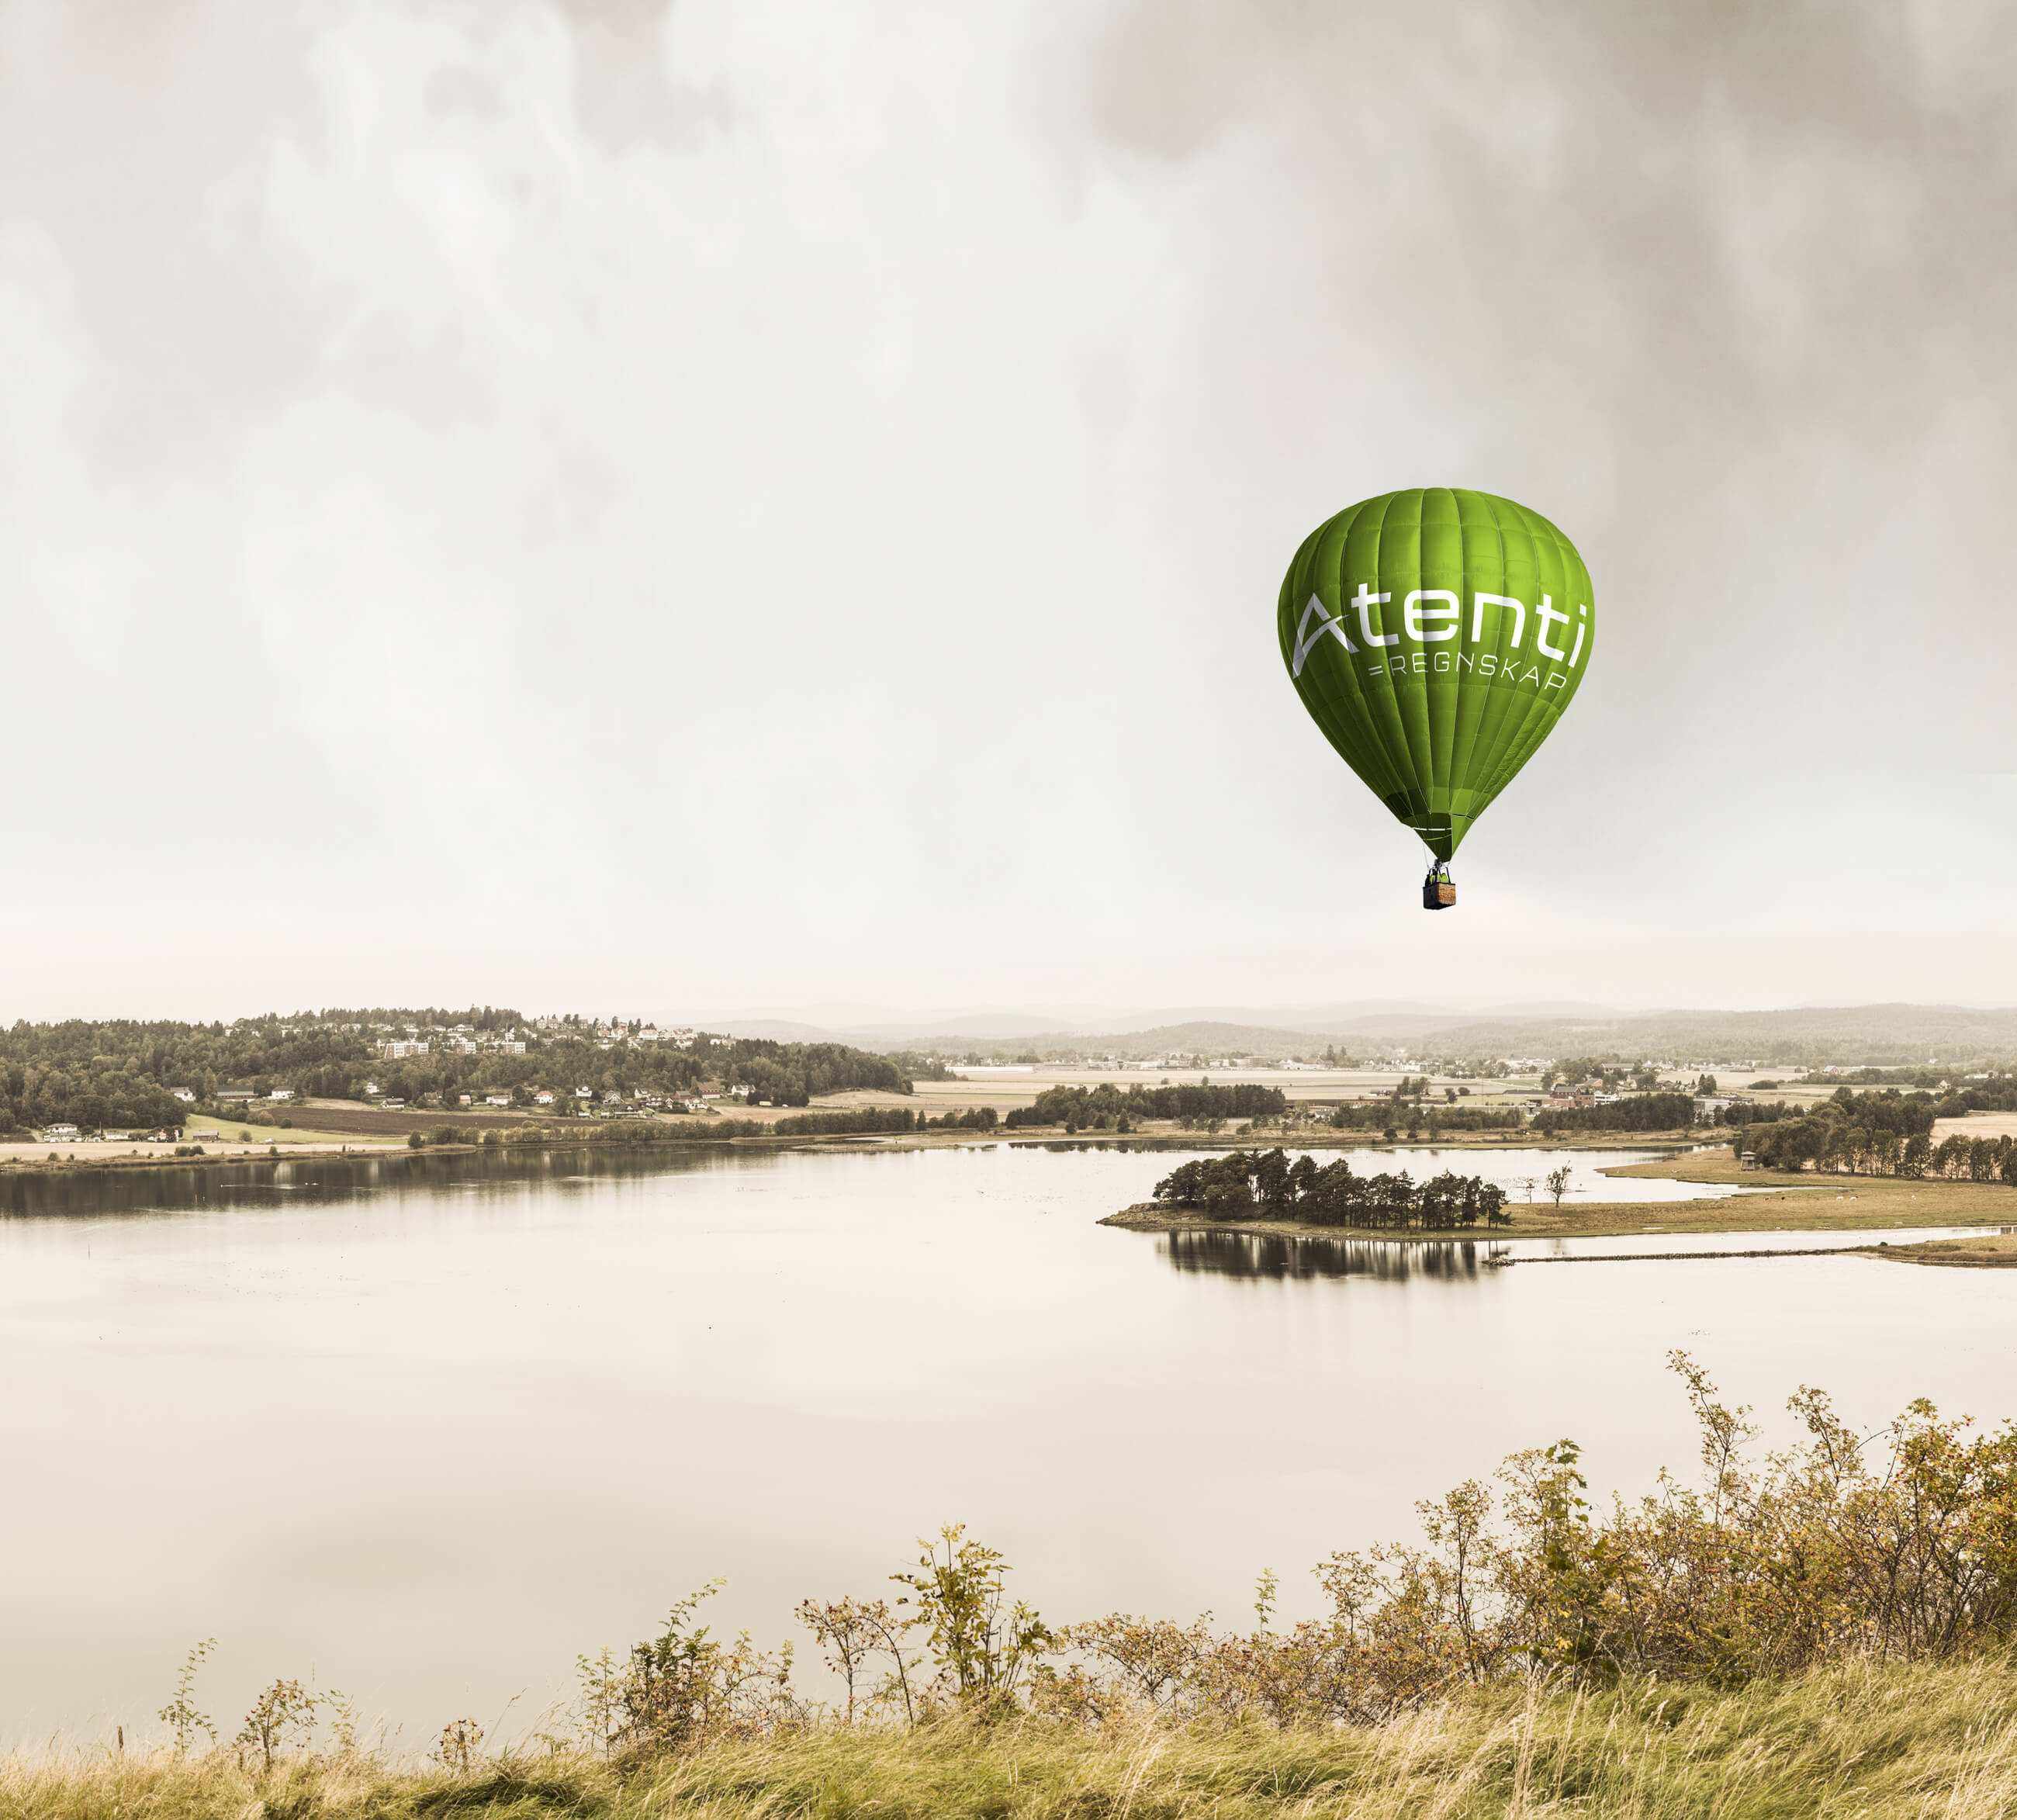 Atenti ballong over Revetal